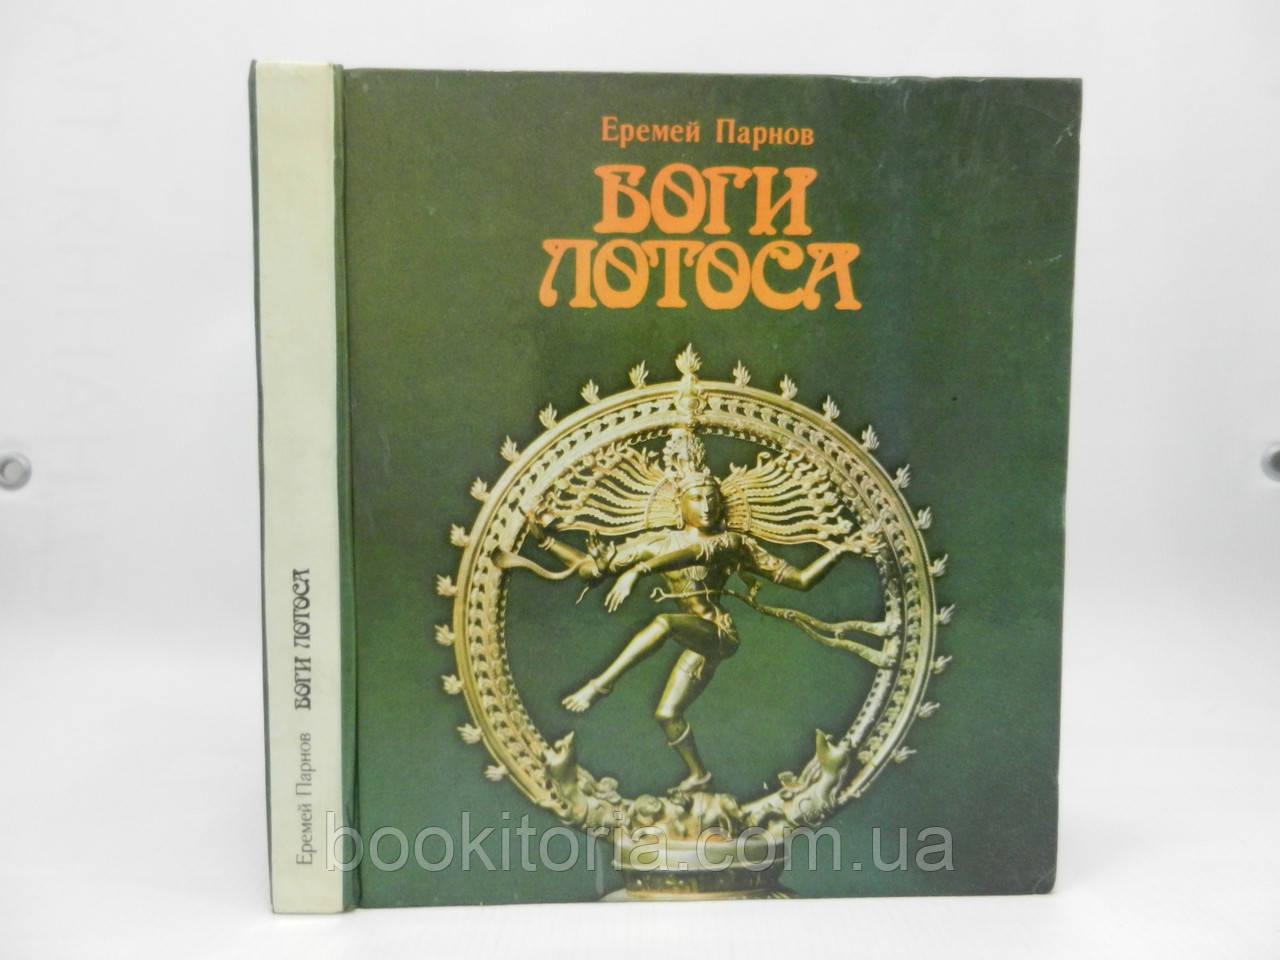 Парнов Е. Боги лотоса (б/у).